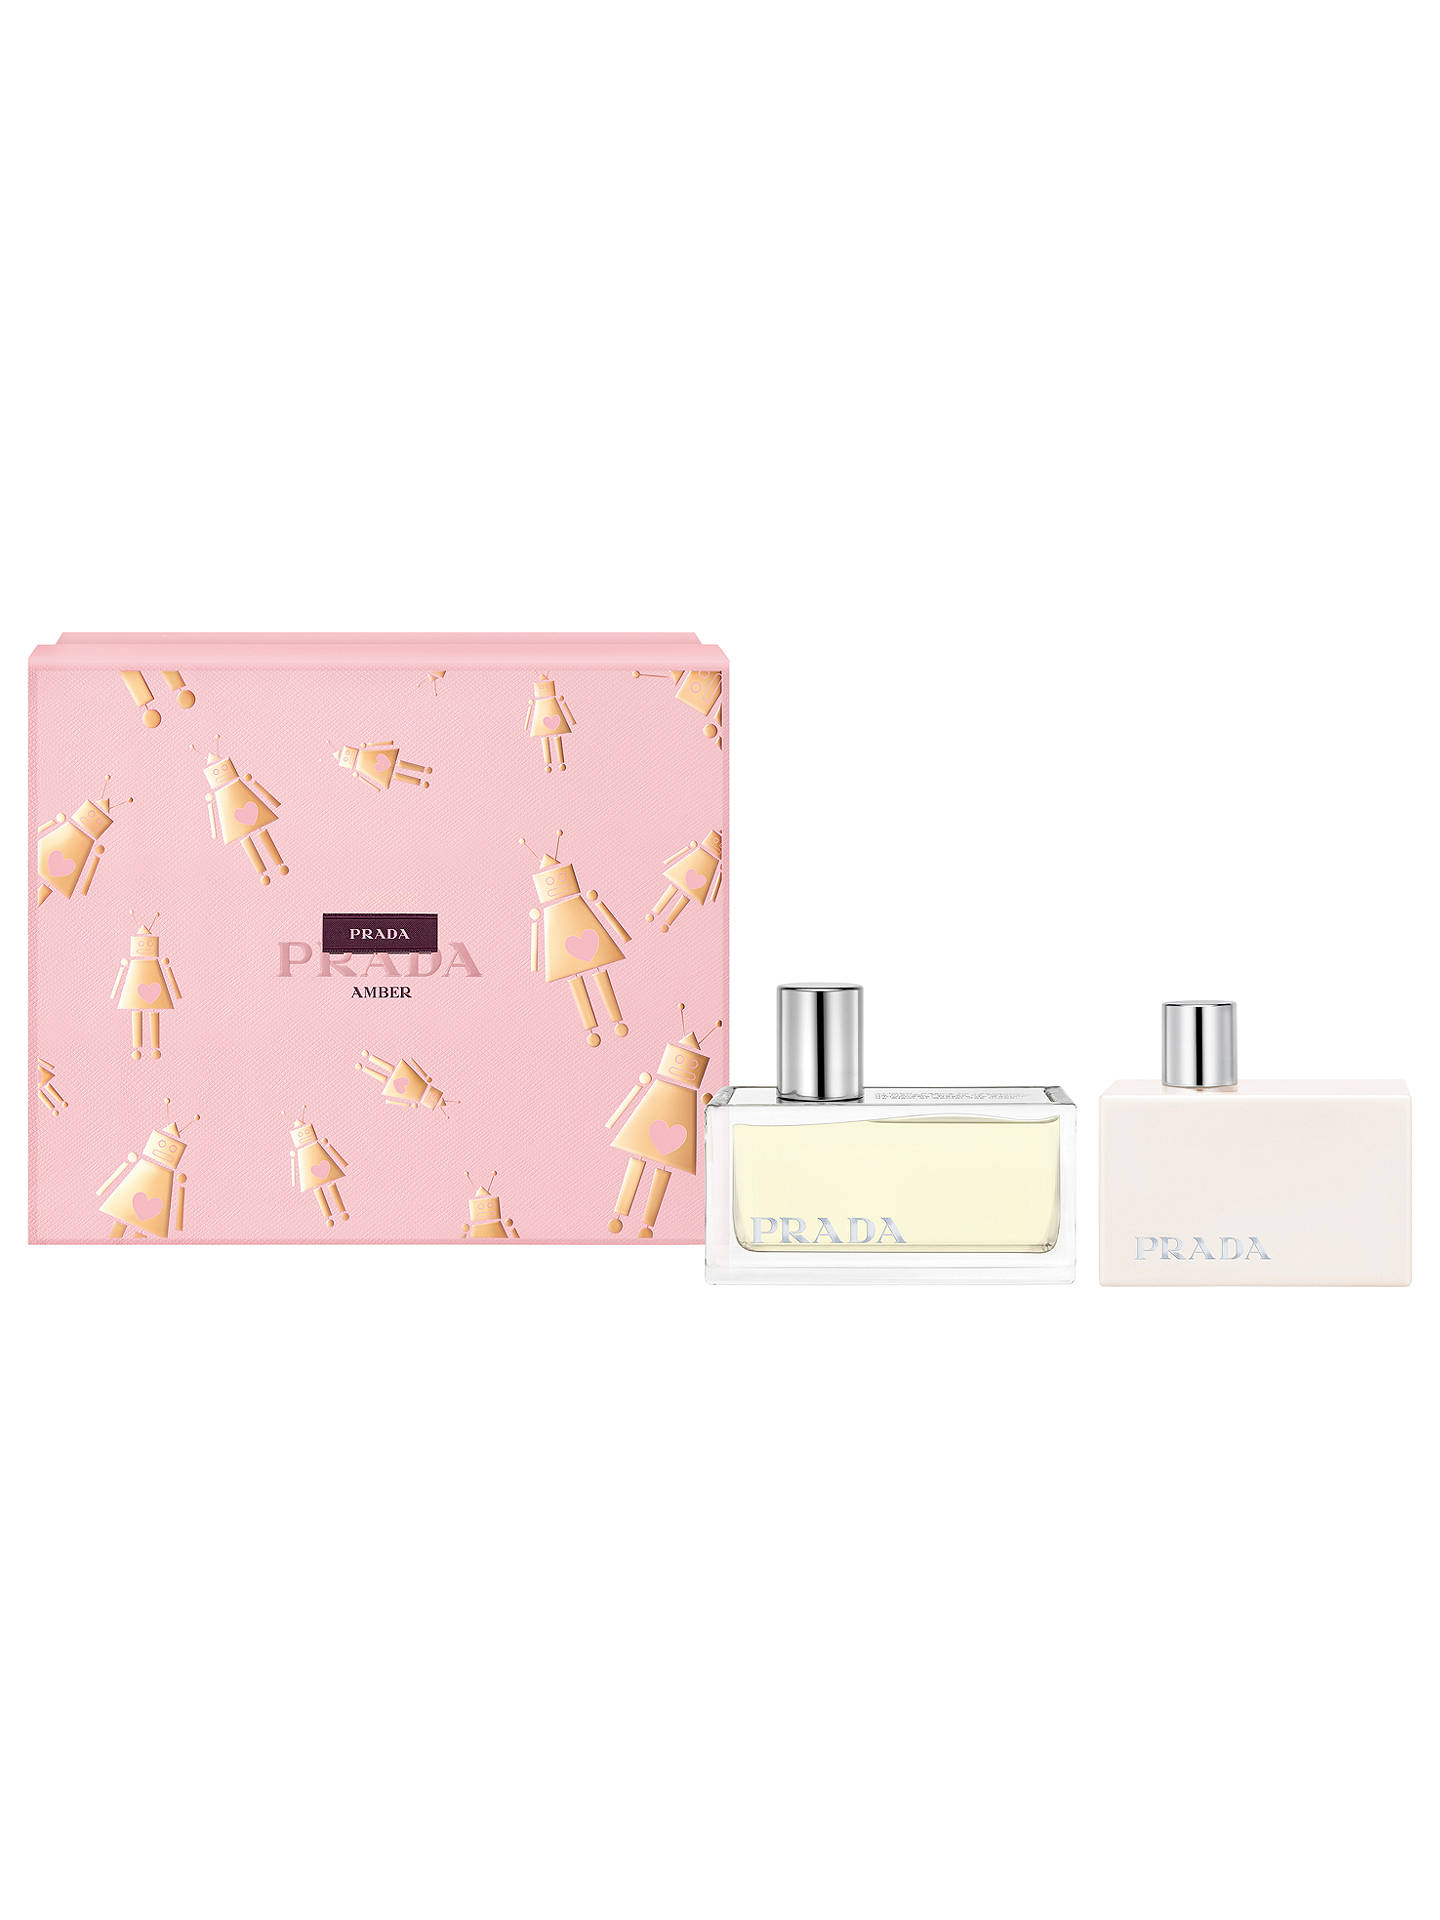 2fe43370 Prada Amber 50ml Eau de Parfum Fragrance Gift Set at John Lewis ...